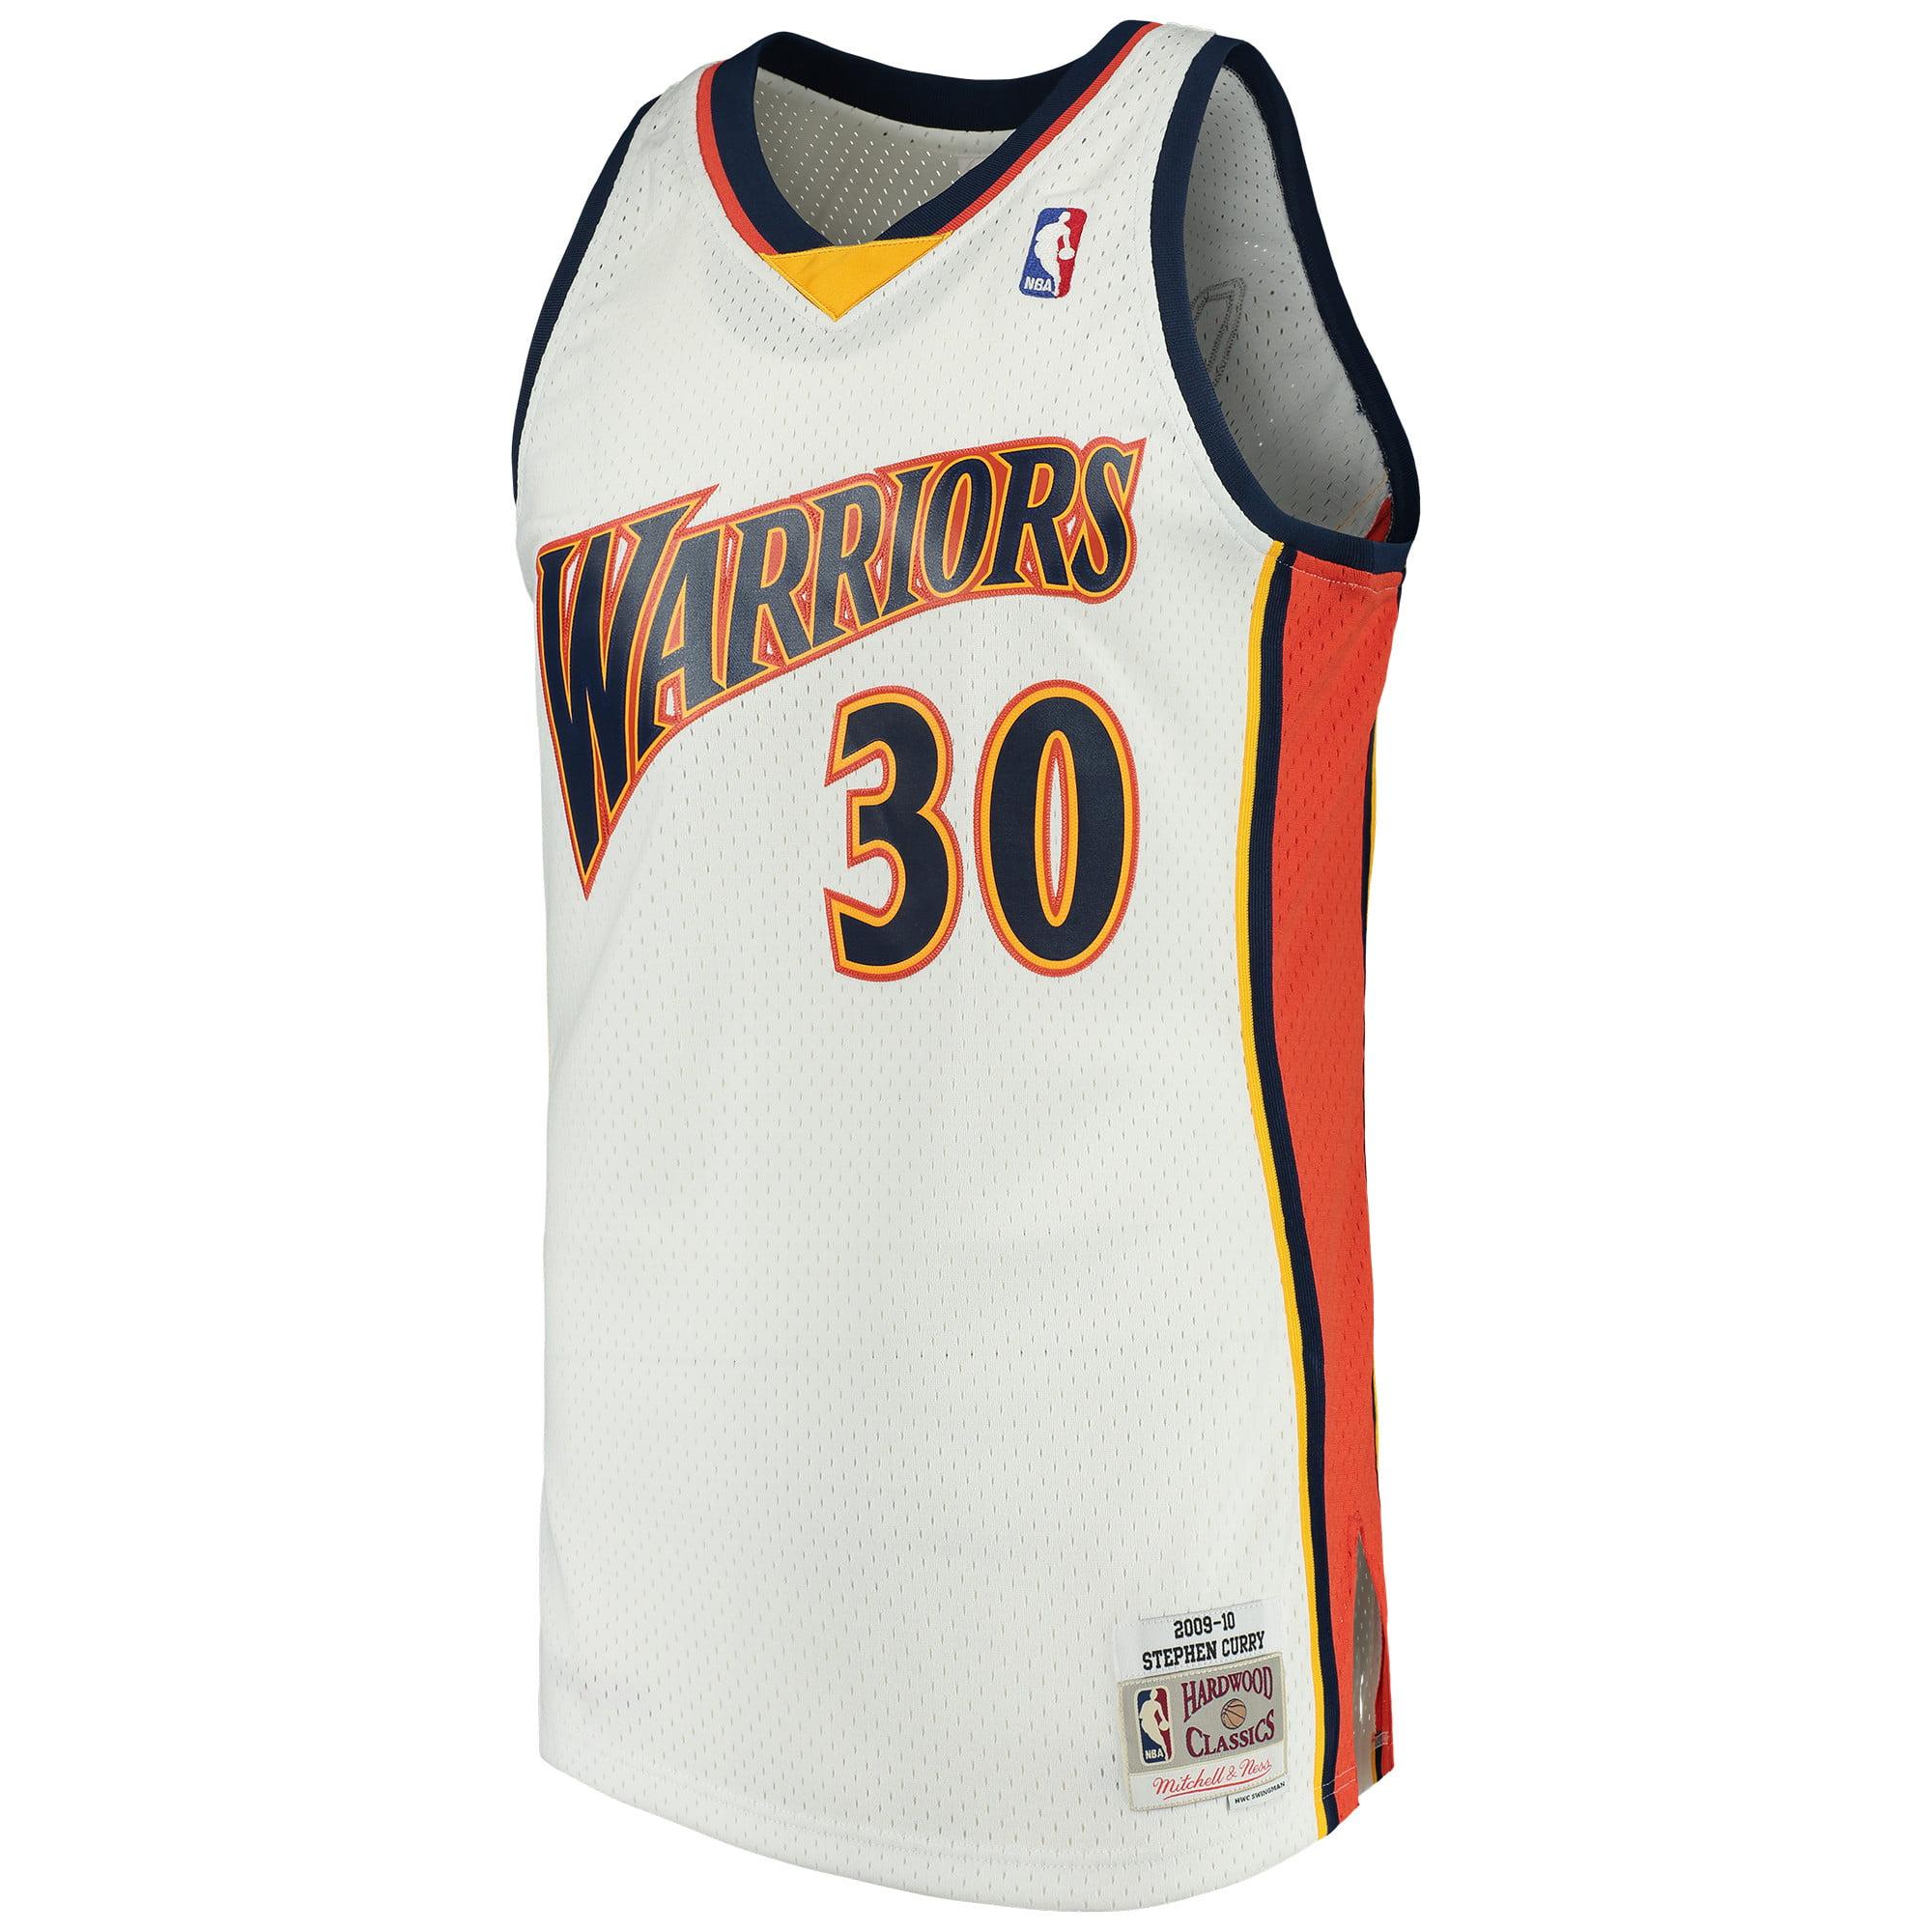 wholesale dealer 1bf75 a4582 Stephen Curry Golden State Warriors Mitchell & Ness Swingman ...